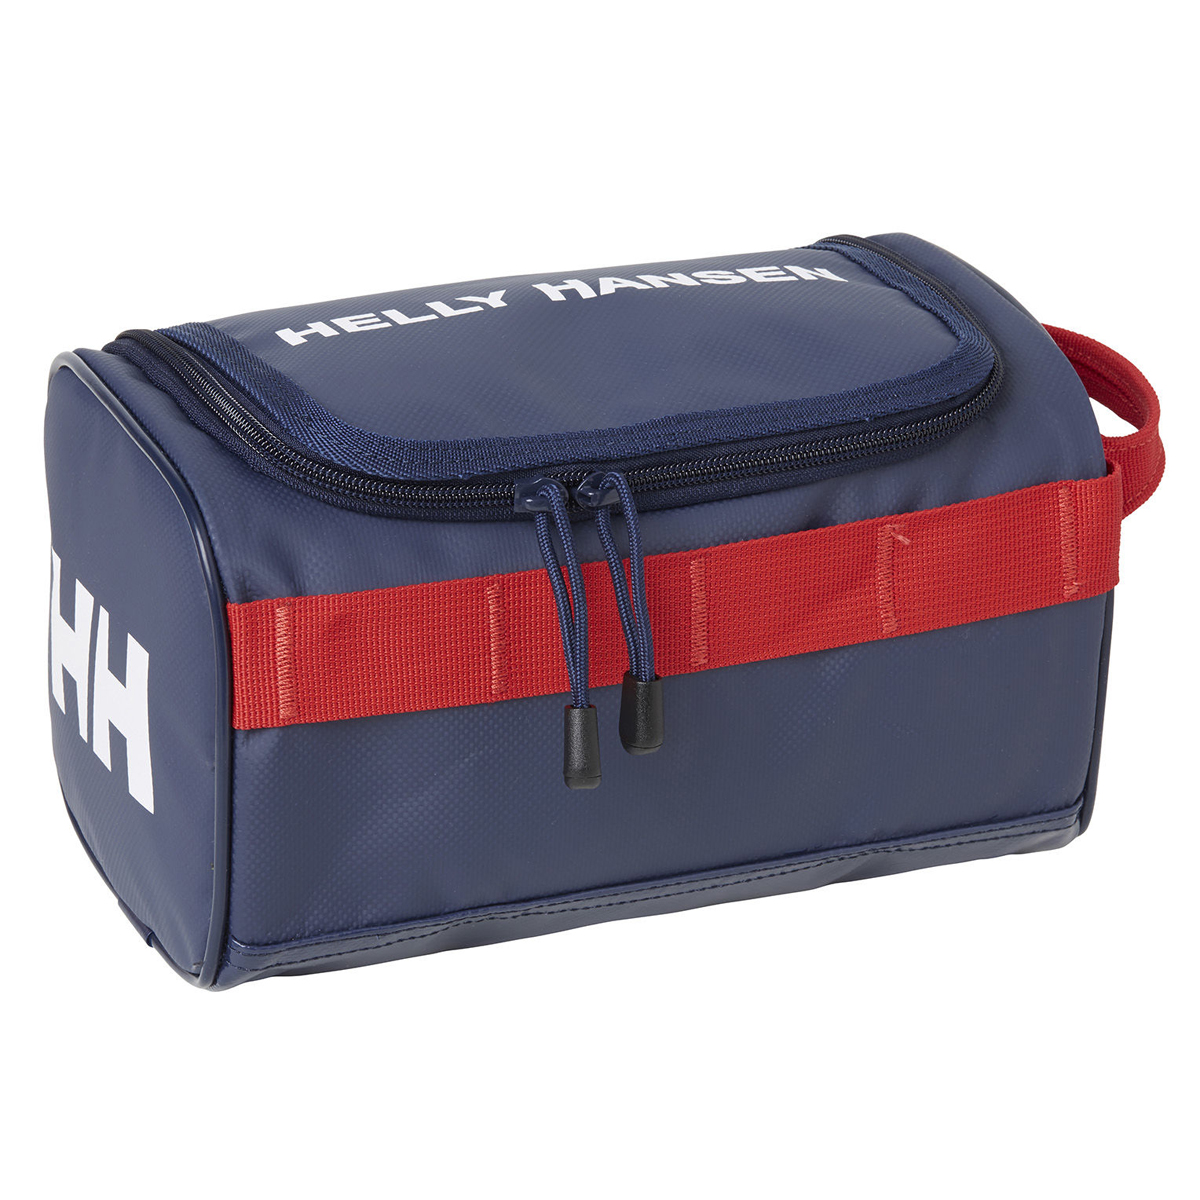 HELLY HANSEN NEW CLASSIC WASH BAG (67170)